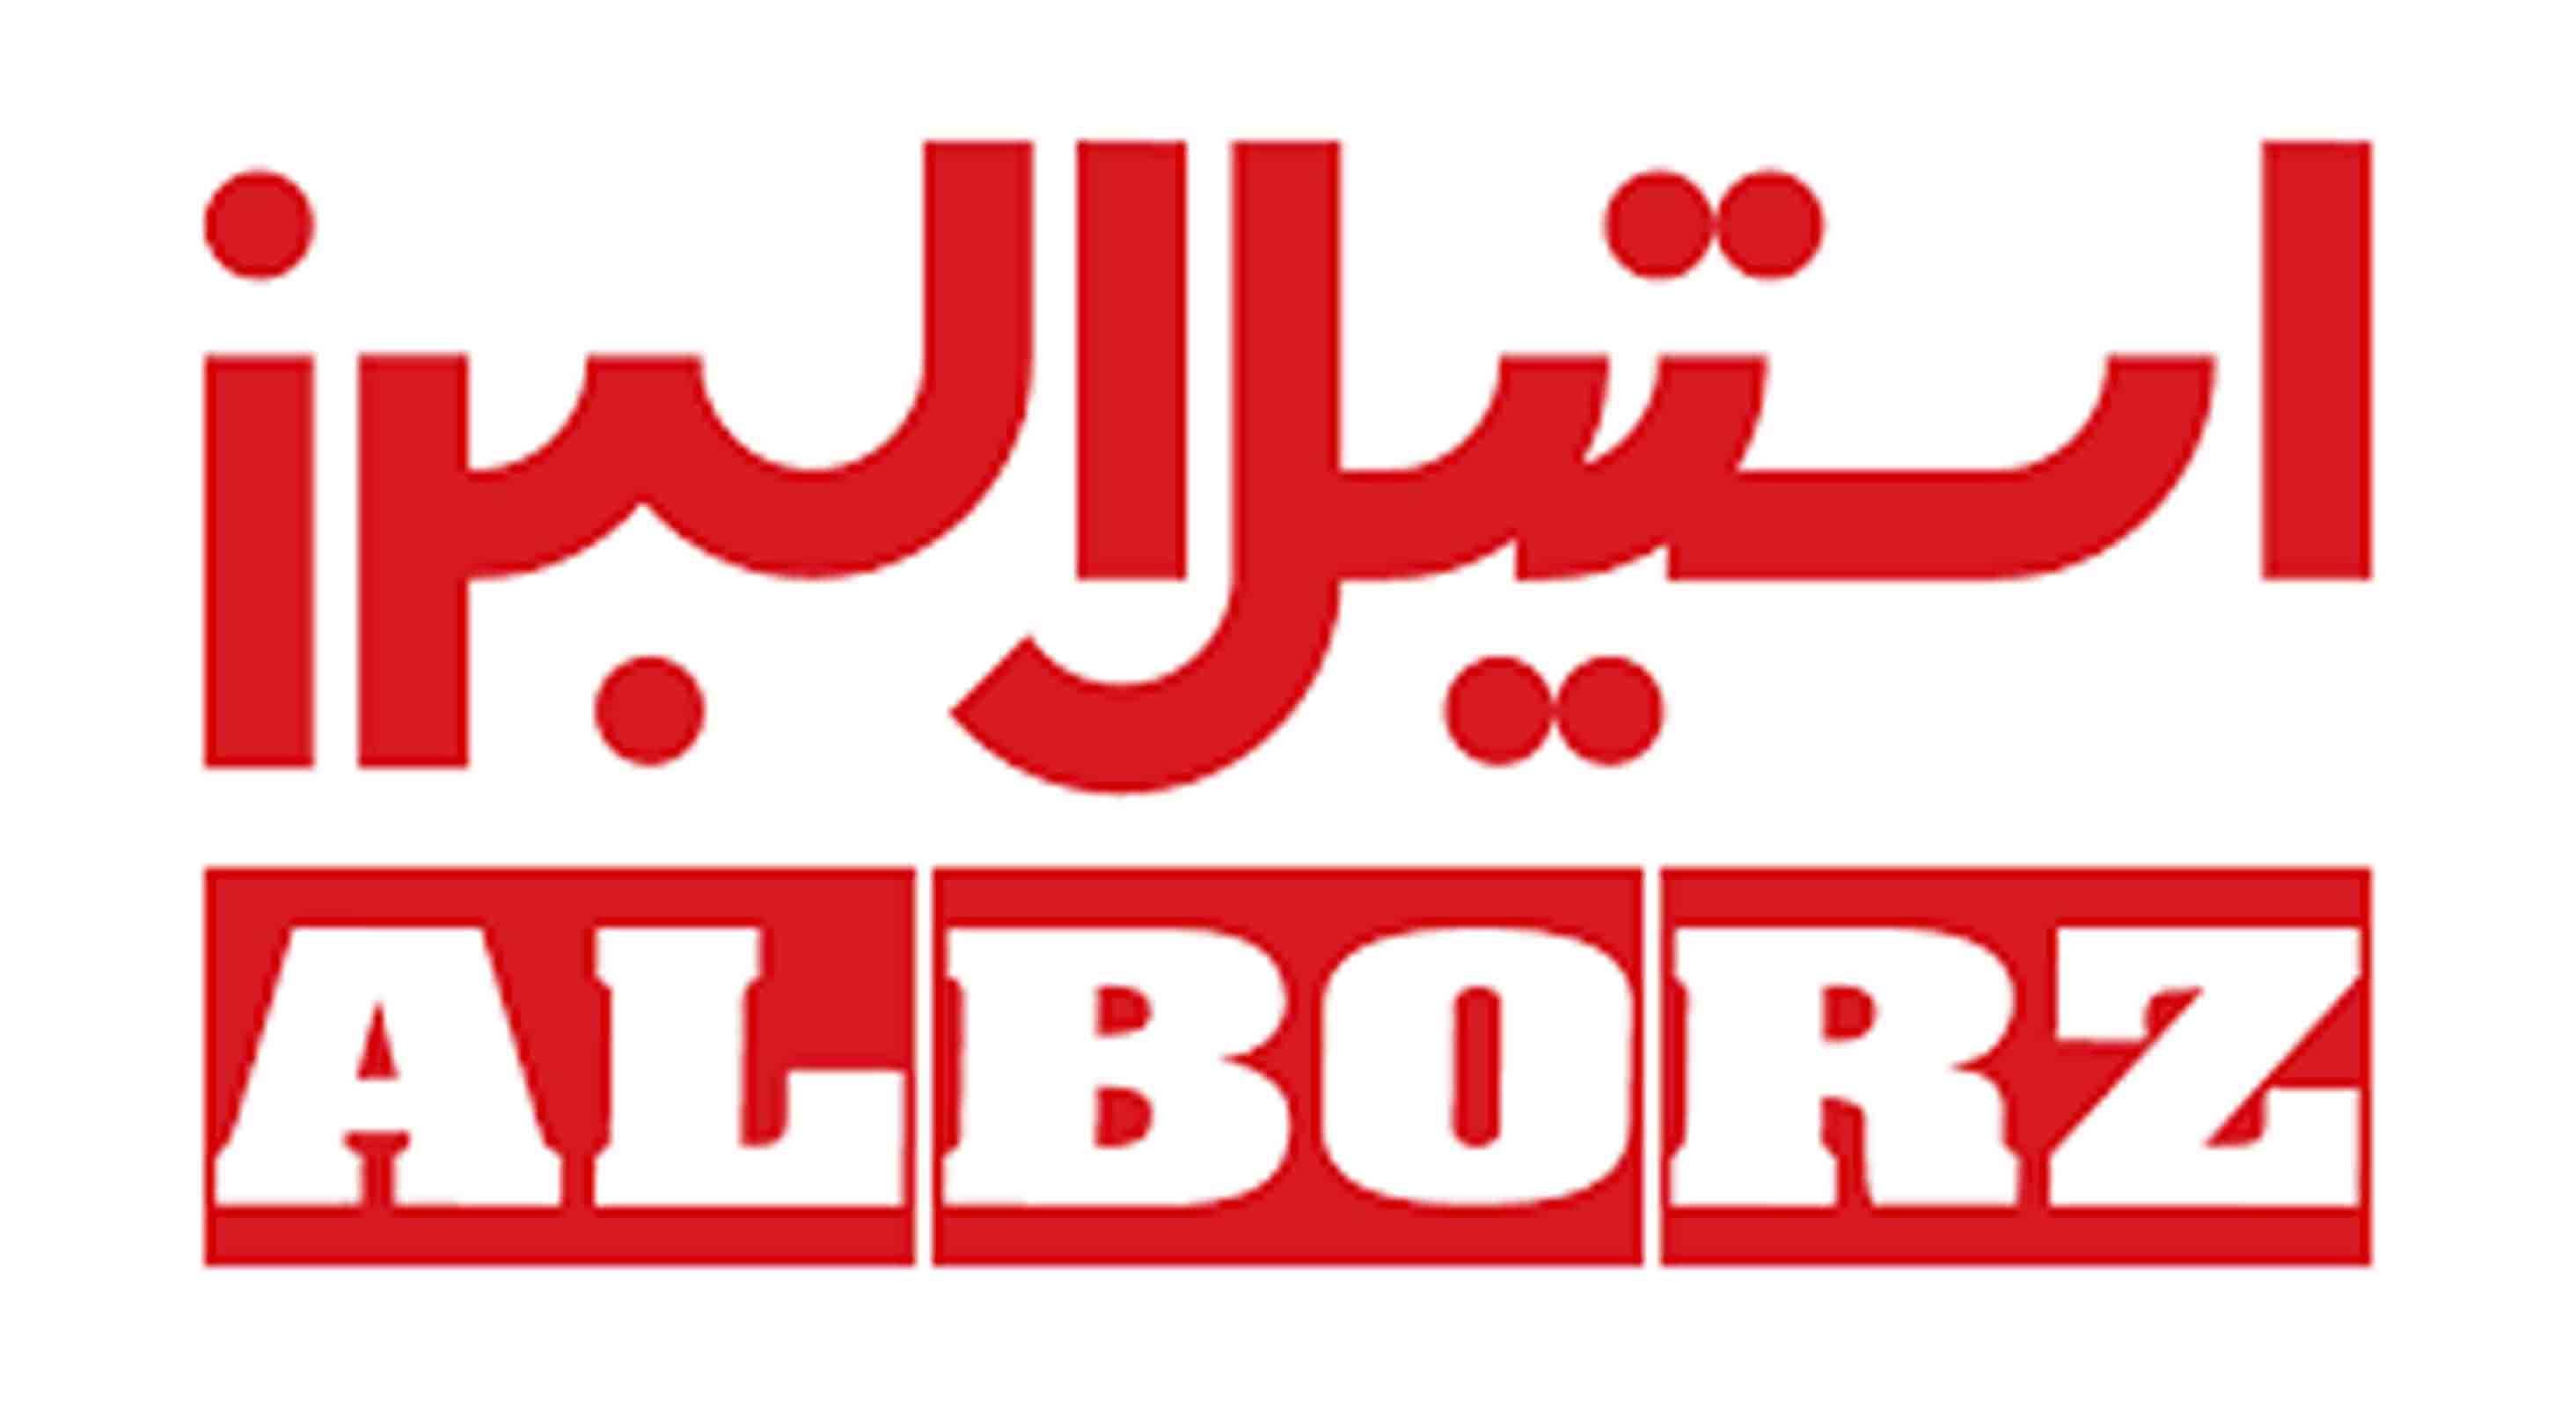 Steel Alborz